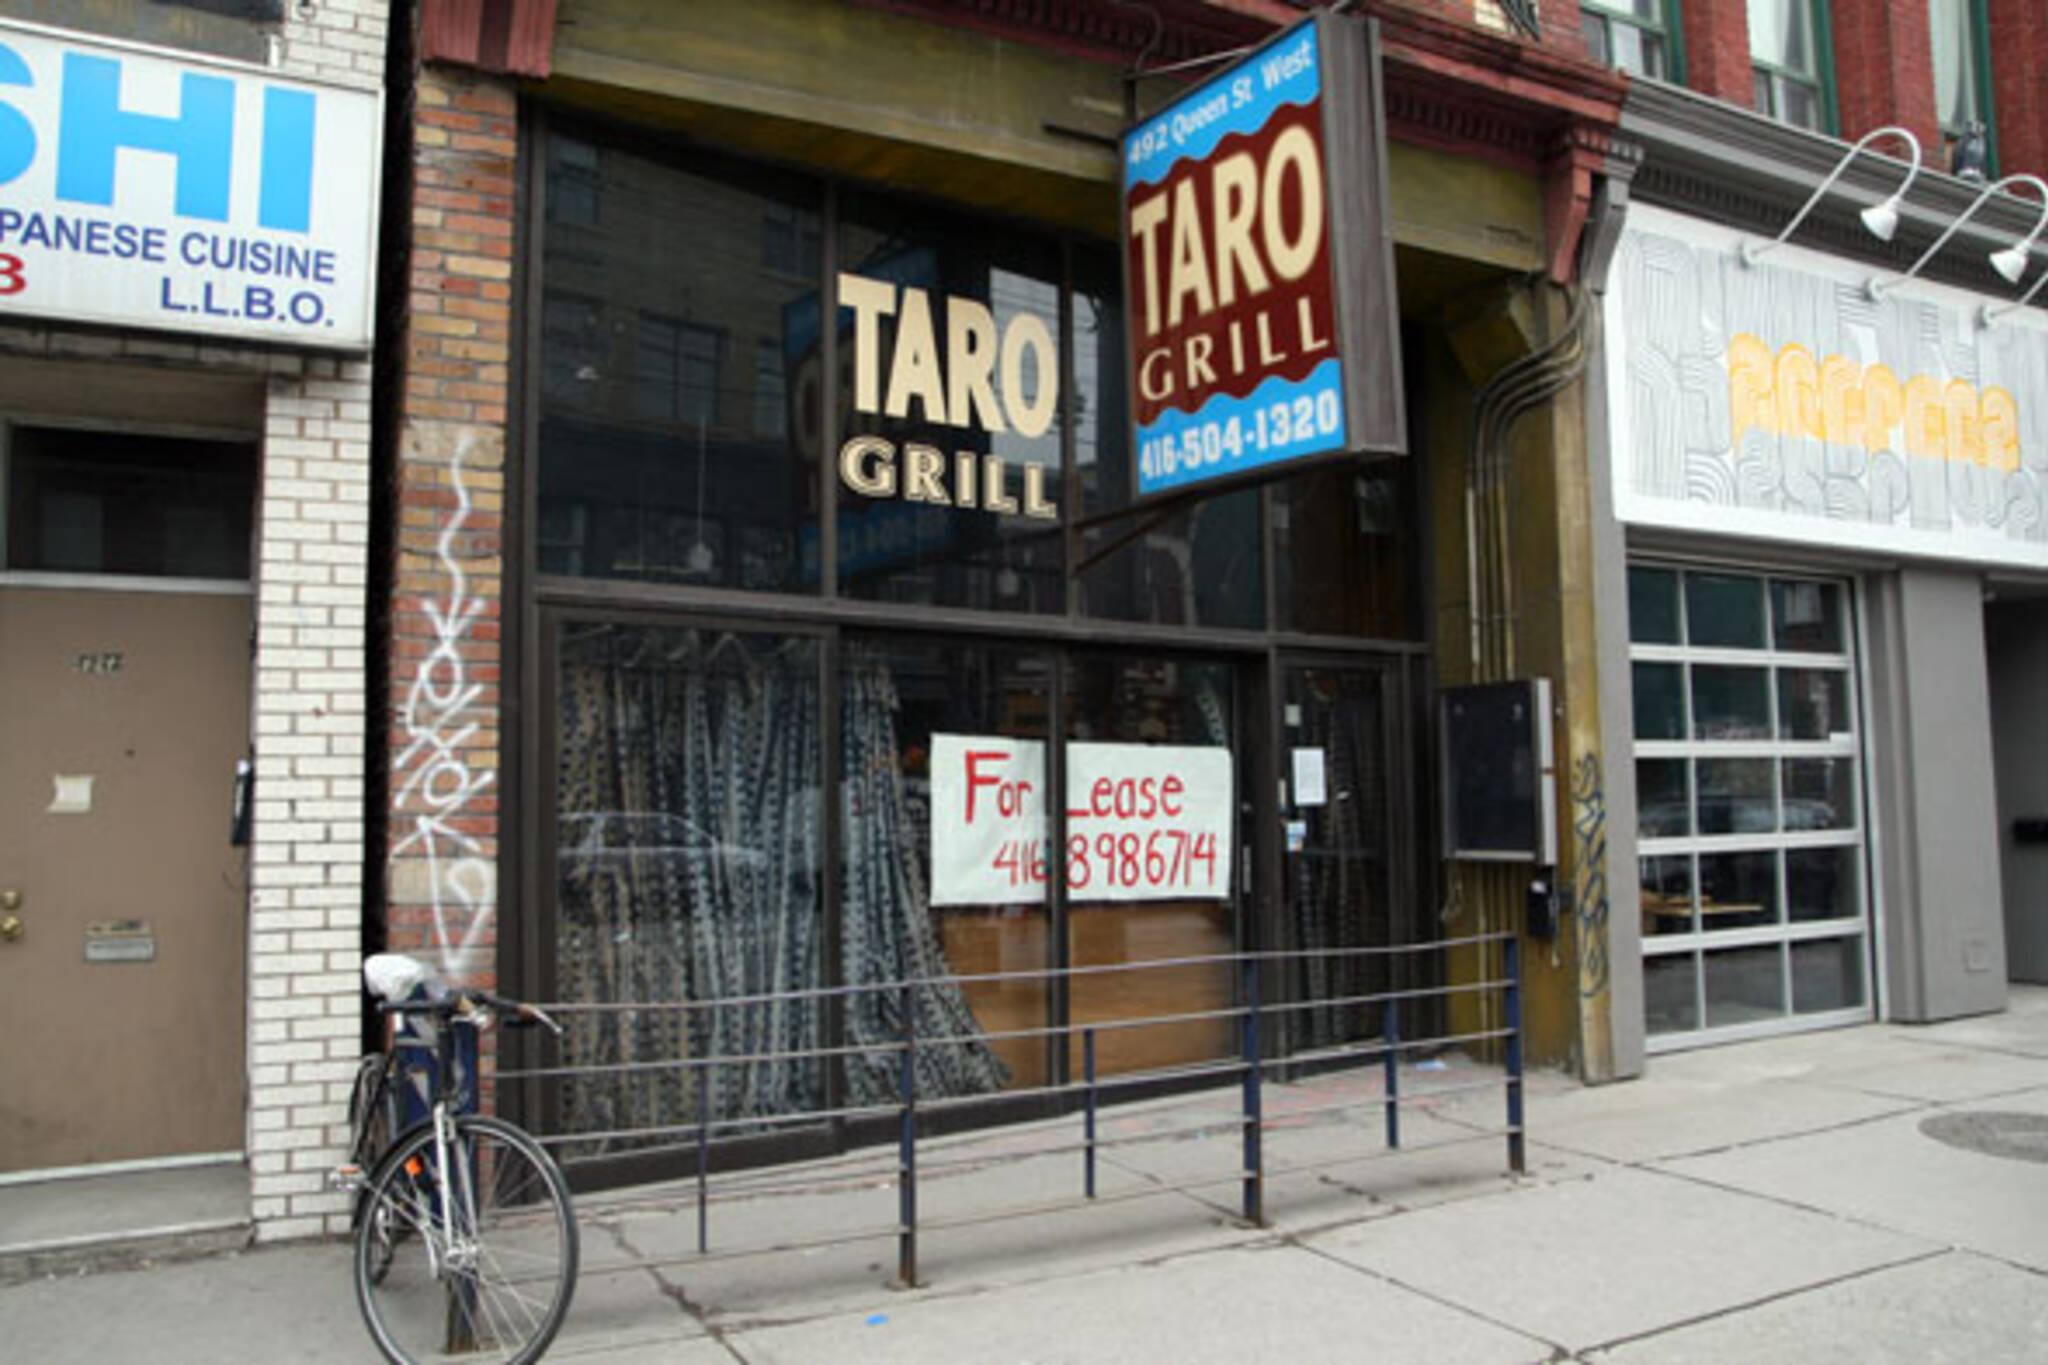 Taro Grill